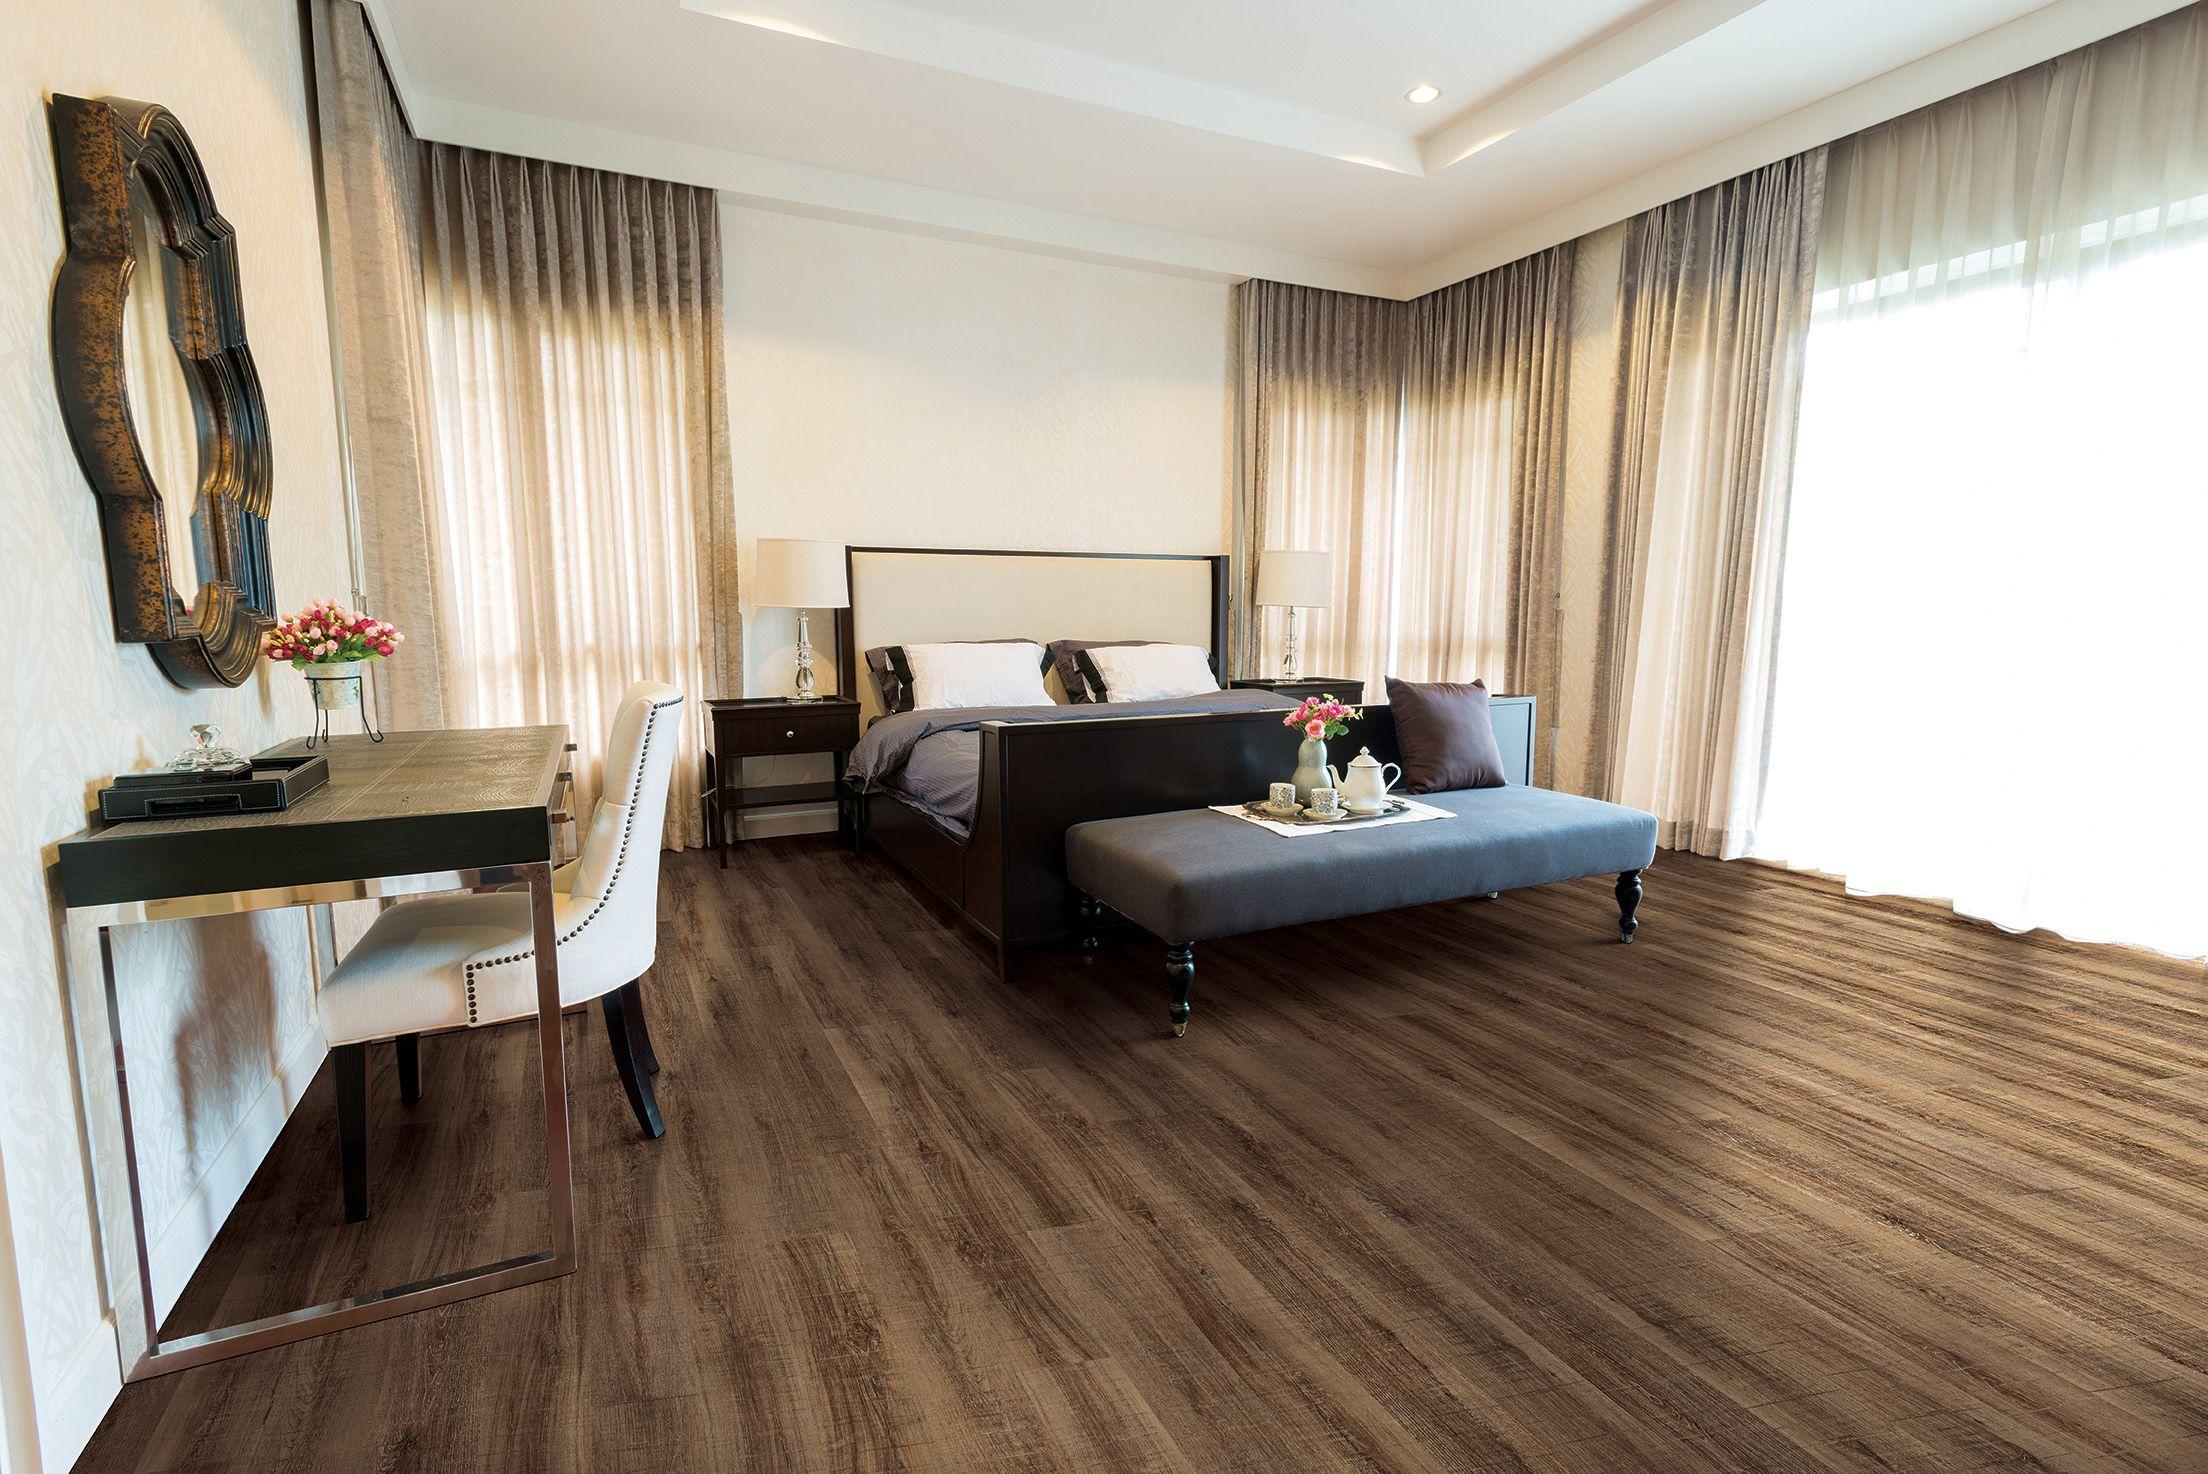 Pvc Vloer Slaapkamer : Vloer slaapkamer affordable woonkamer met parket en houten